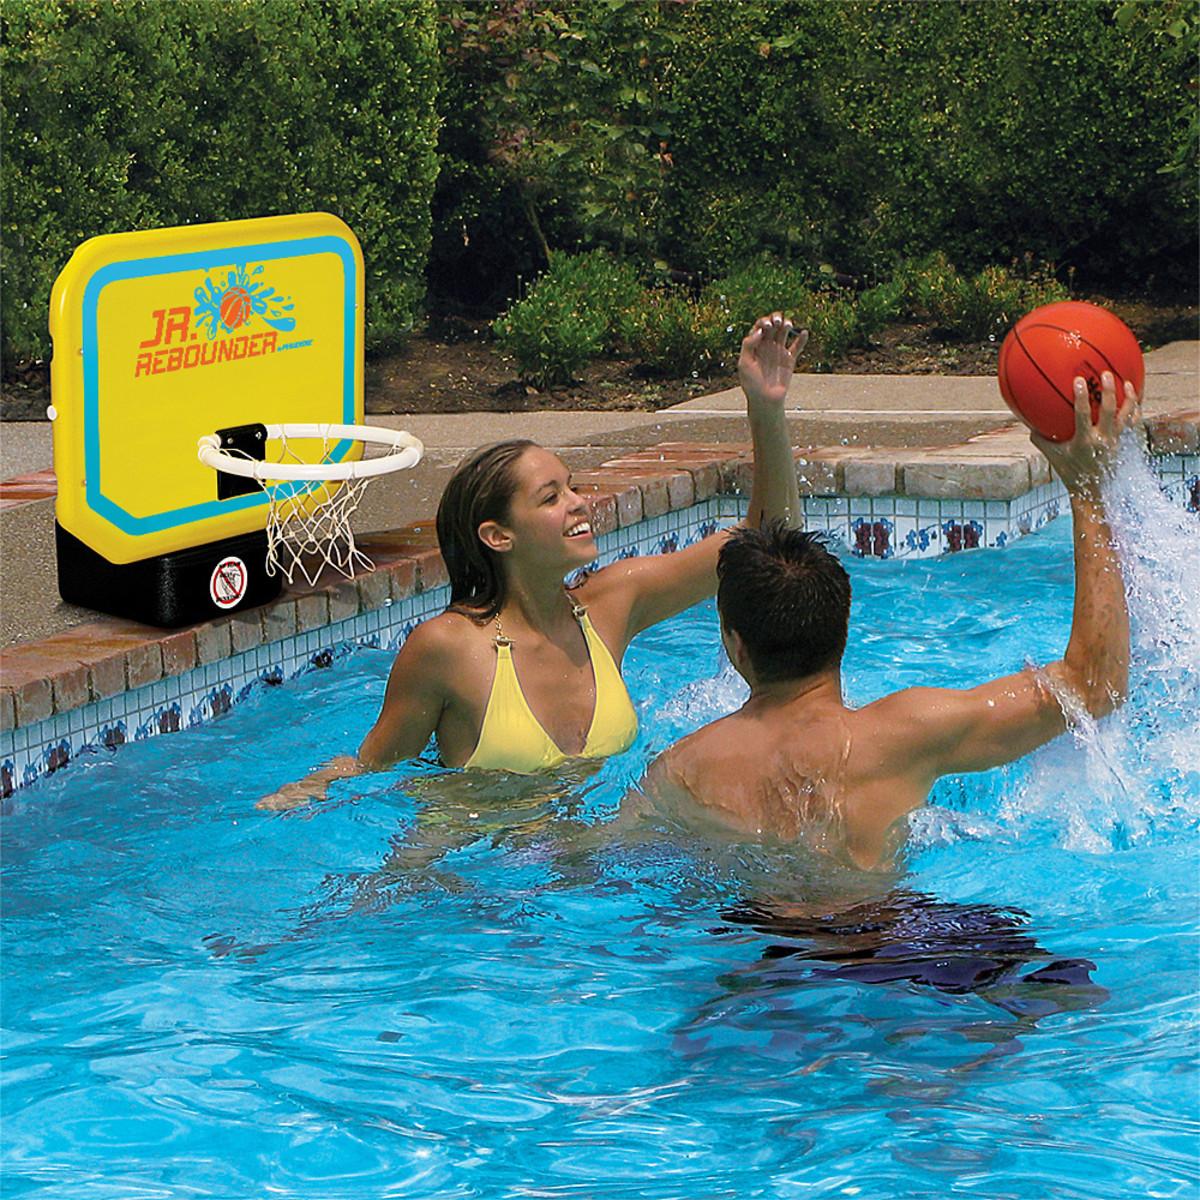 Poolmaster junior pro poolside basketball game pool sports games splash super center - Pool basketball ...